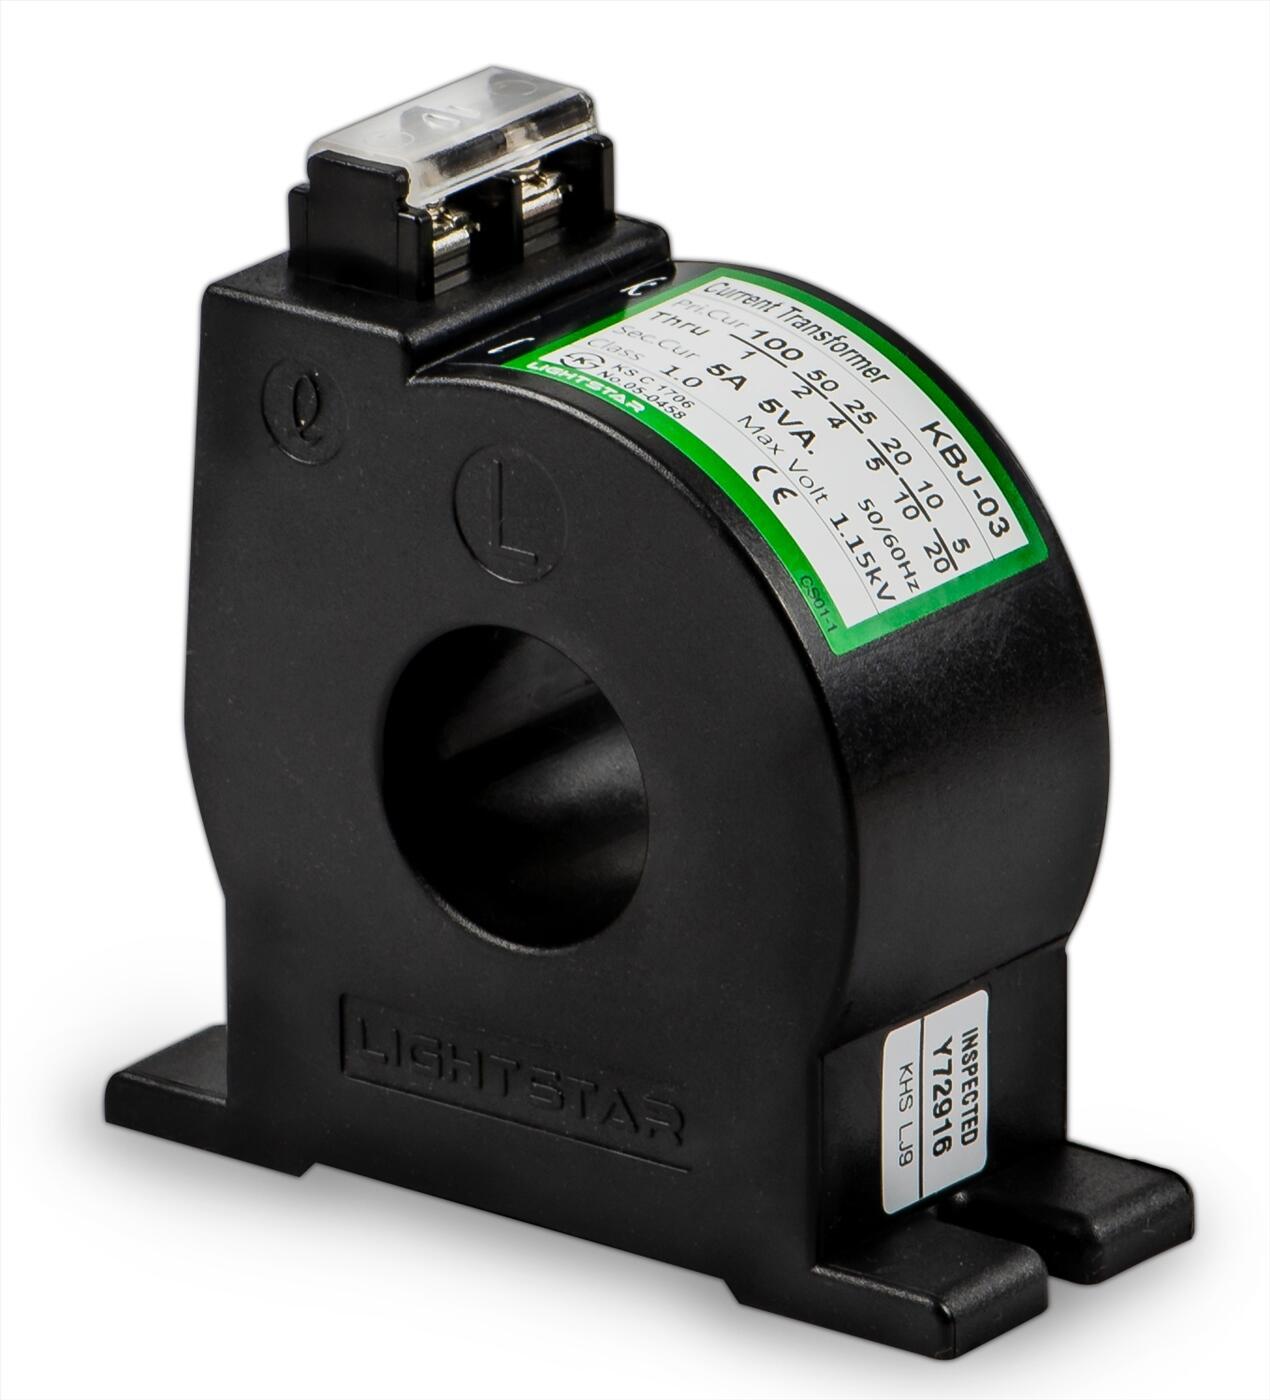 Biến dòng đo lường KBJ-03 (100/5A,120/5A,150/5A,200/5A,300/5A,400/5A)